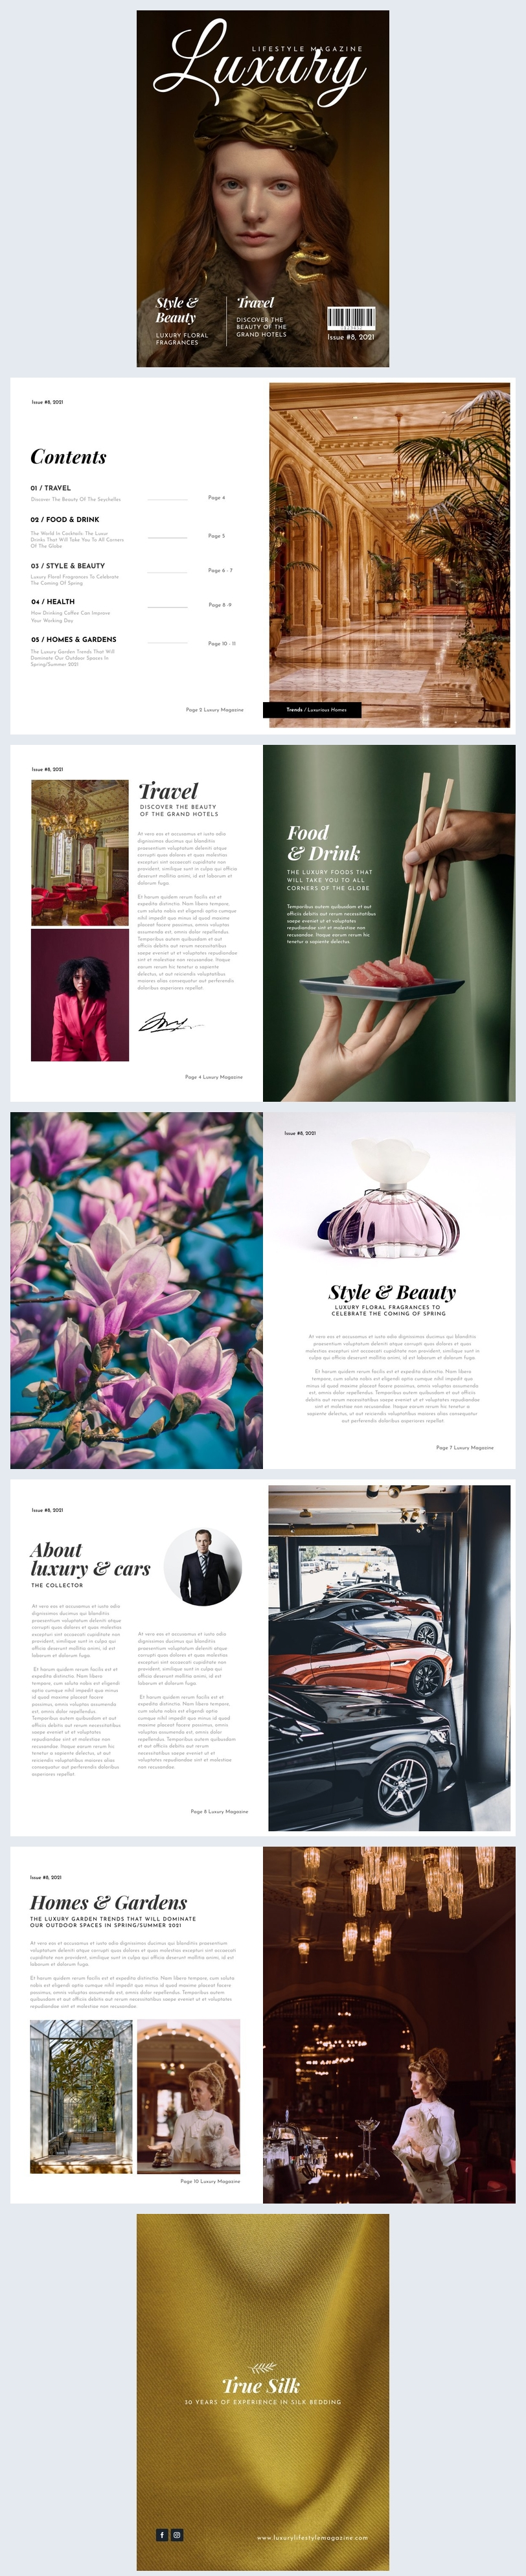 Luxus-Lifestyle-Magazin-Design